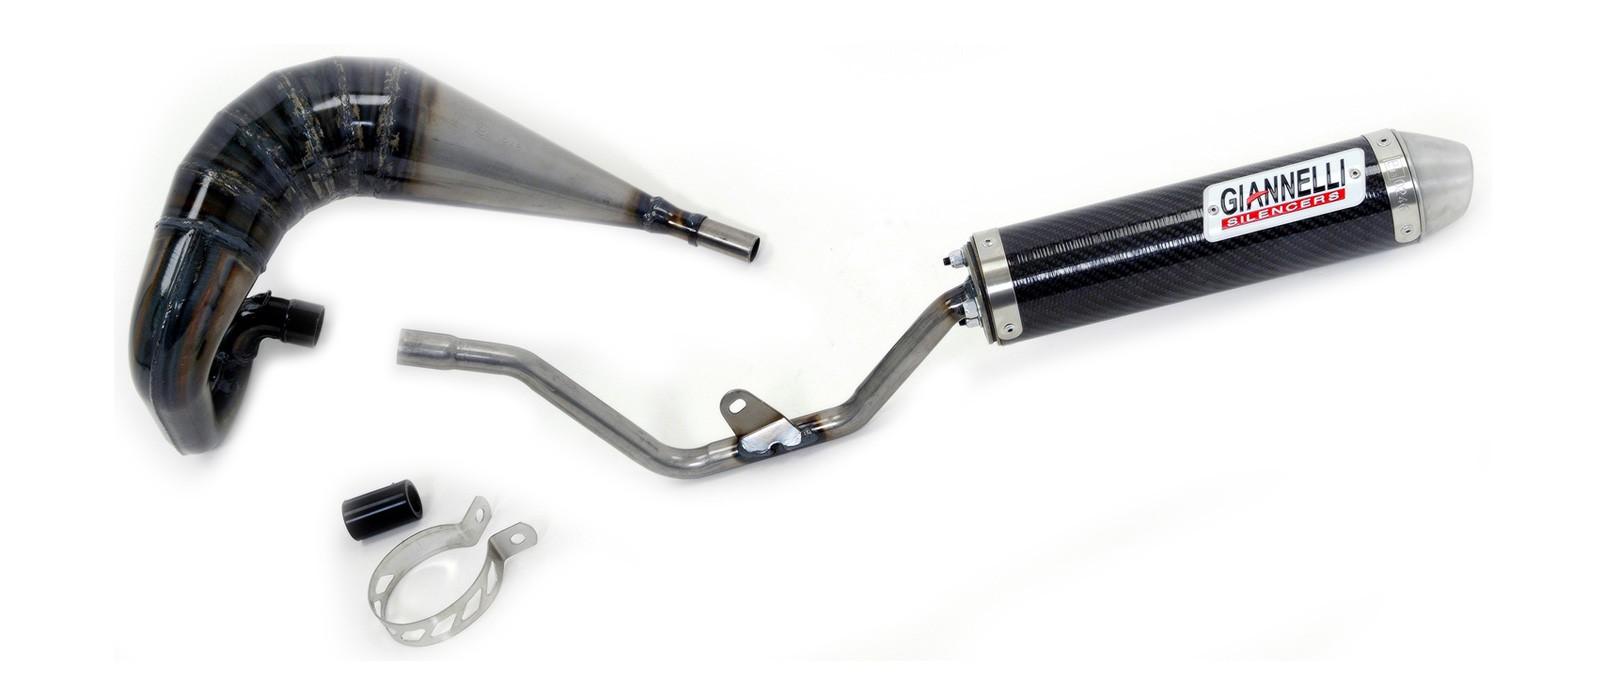 ESCAPES GIANNELLI BETA - Silenciador aluminio enduro/cross 2T Beta RR 50 Motard Giannelli 34689HF -